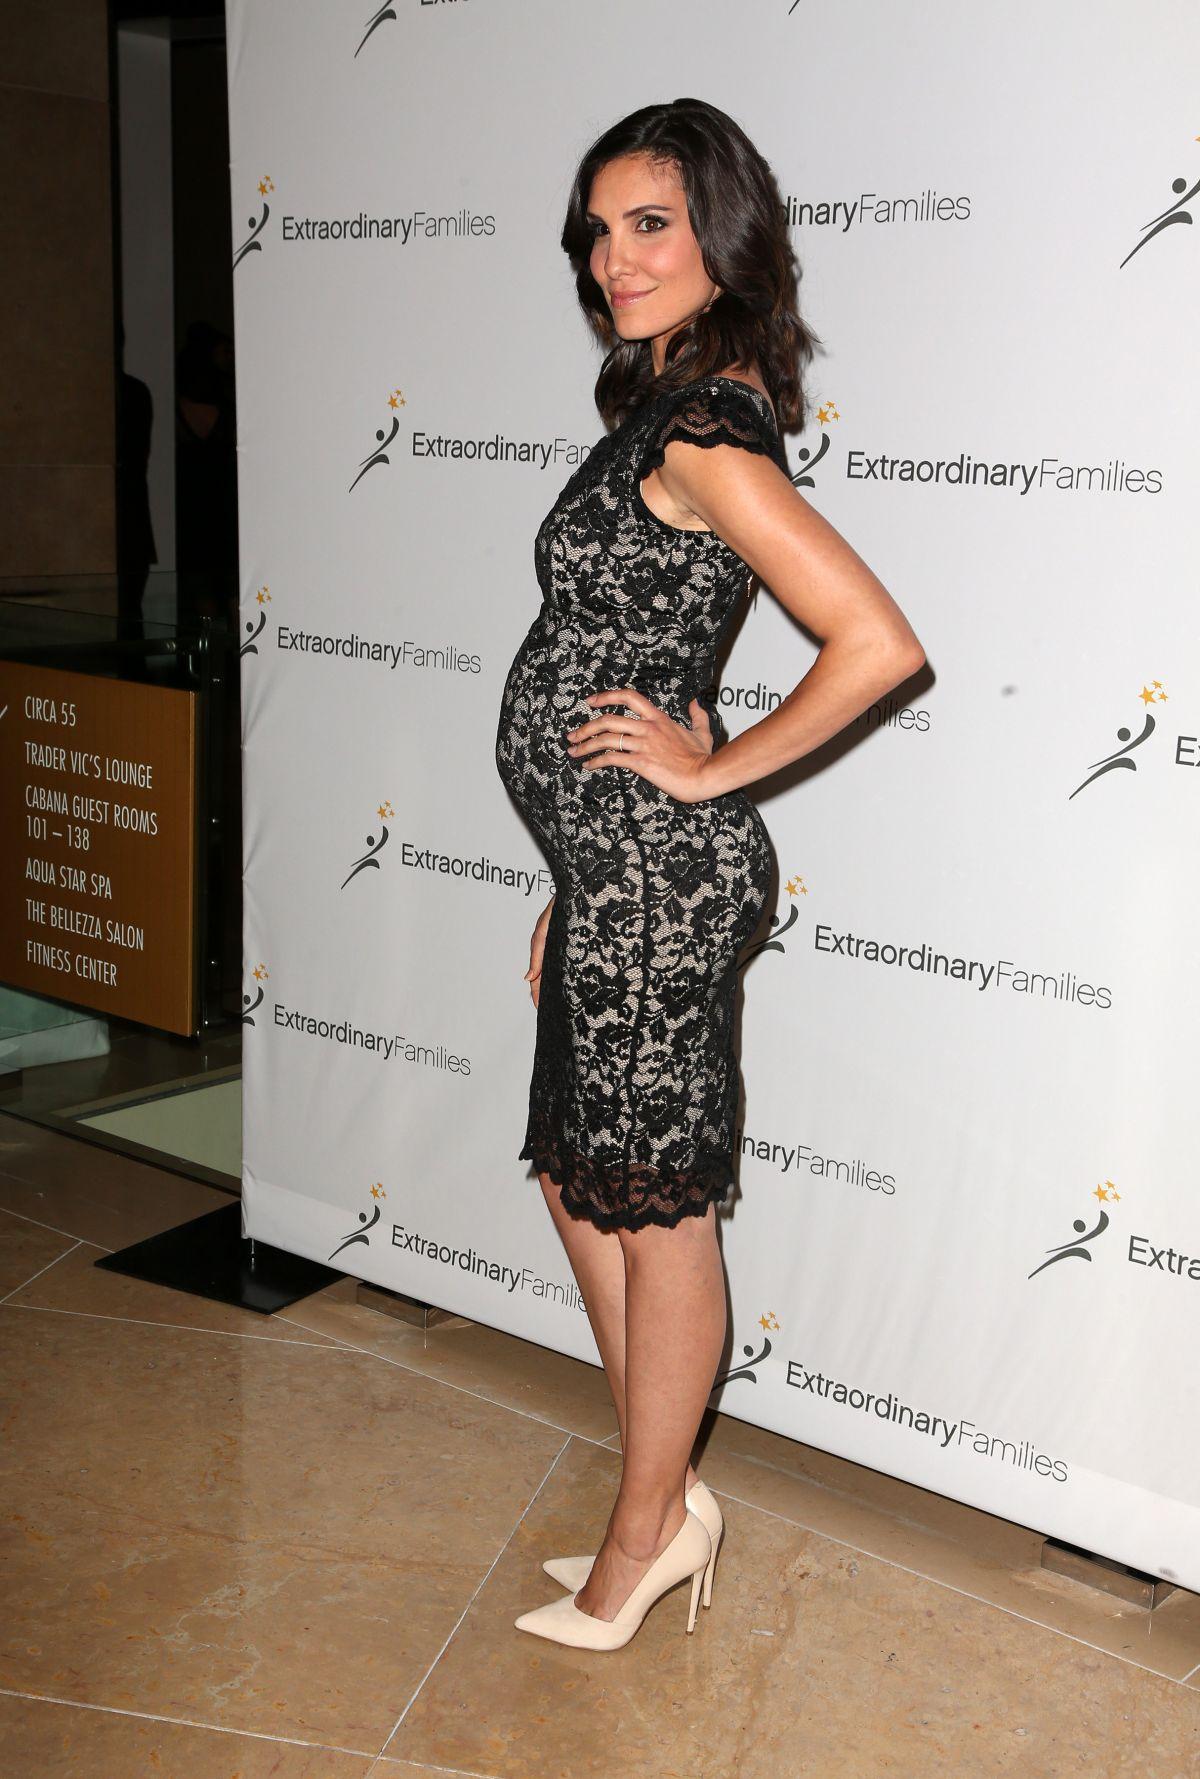 Megan Fox Pregnant - newhairstylesformen2014.com